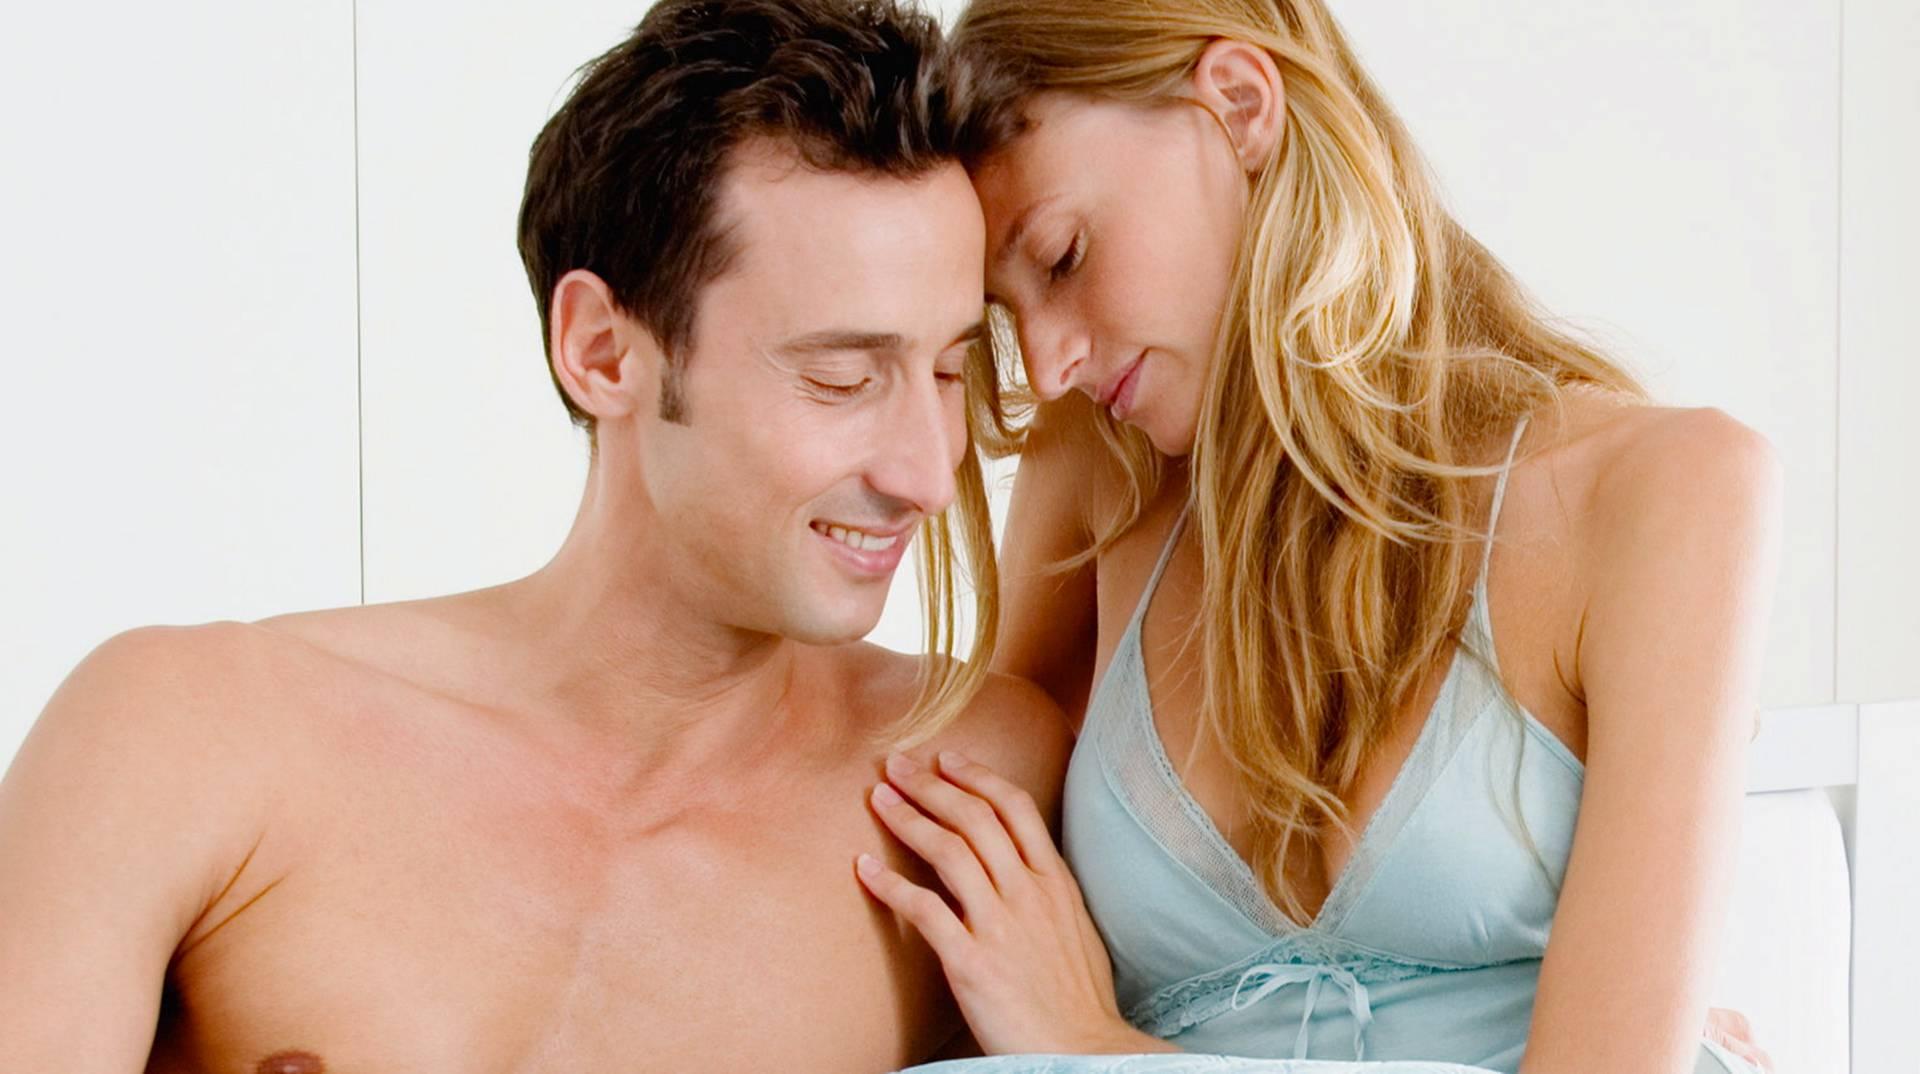 Pennsylvania laki dating johdanto esimerkkejä online dating.